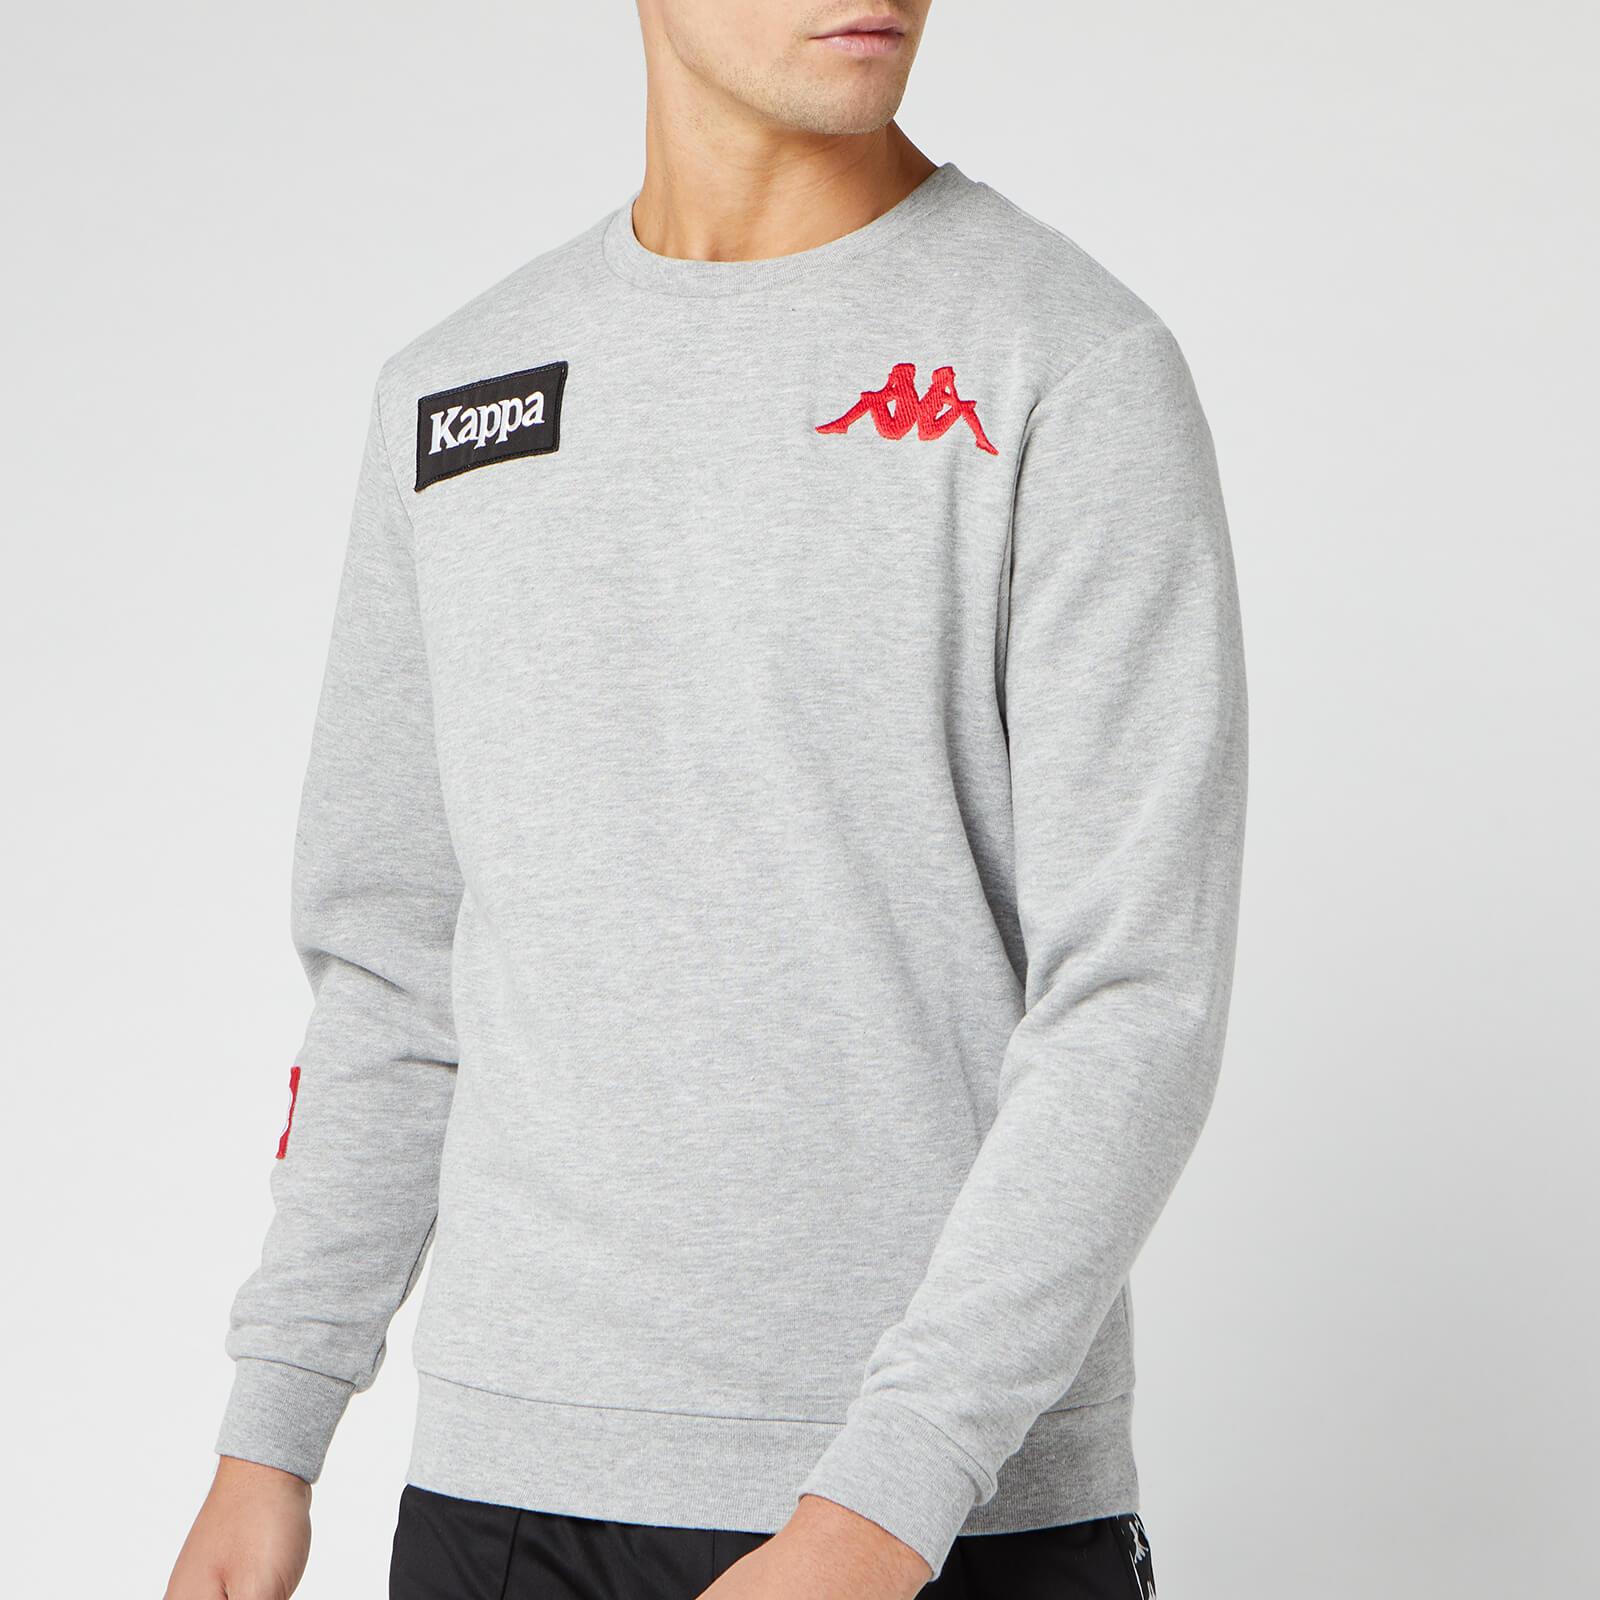 Kappa Men's Authentic La Bayza USA Sweatshirt - Grey Melange - XL